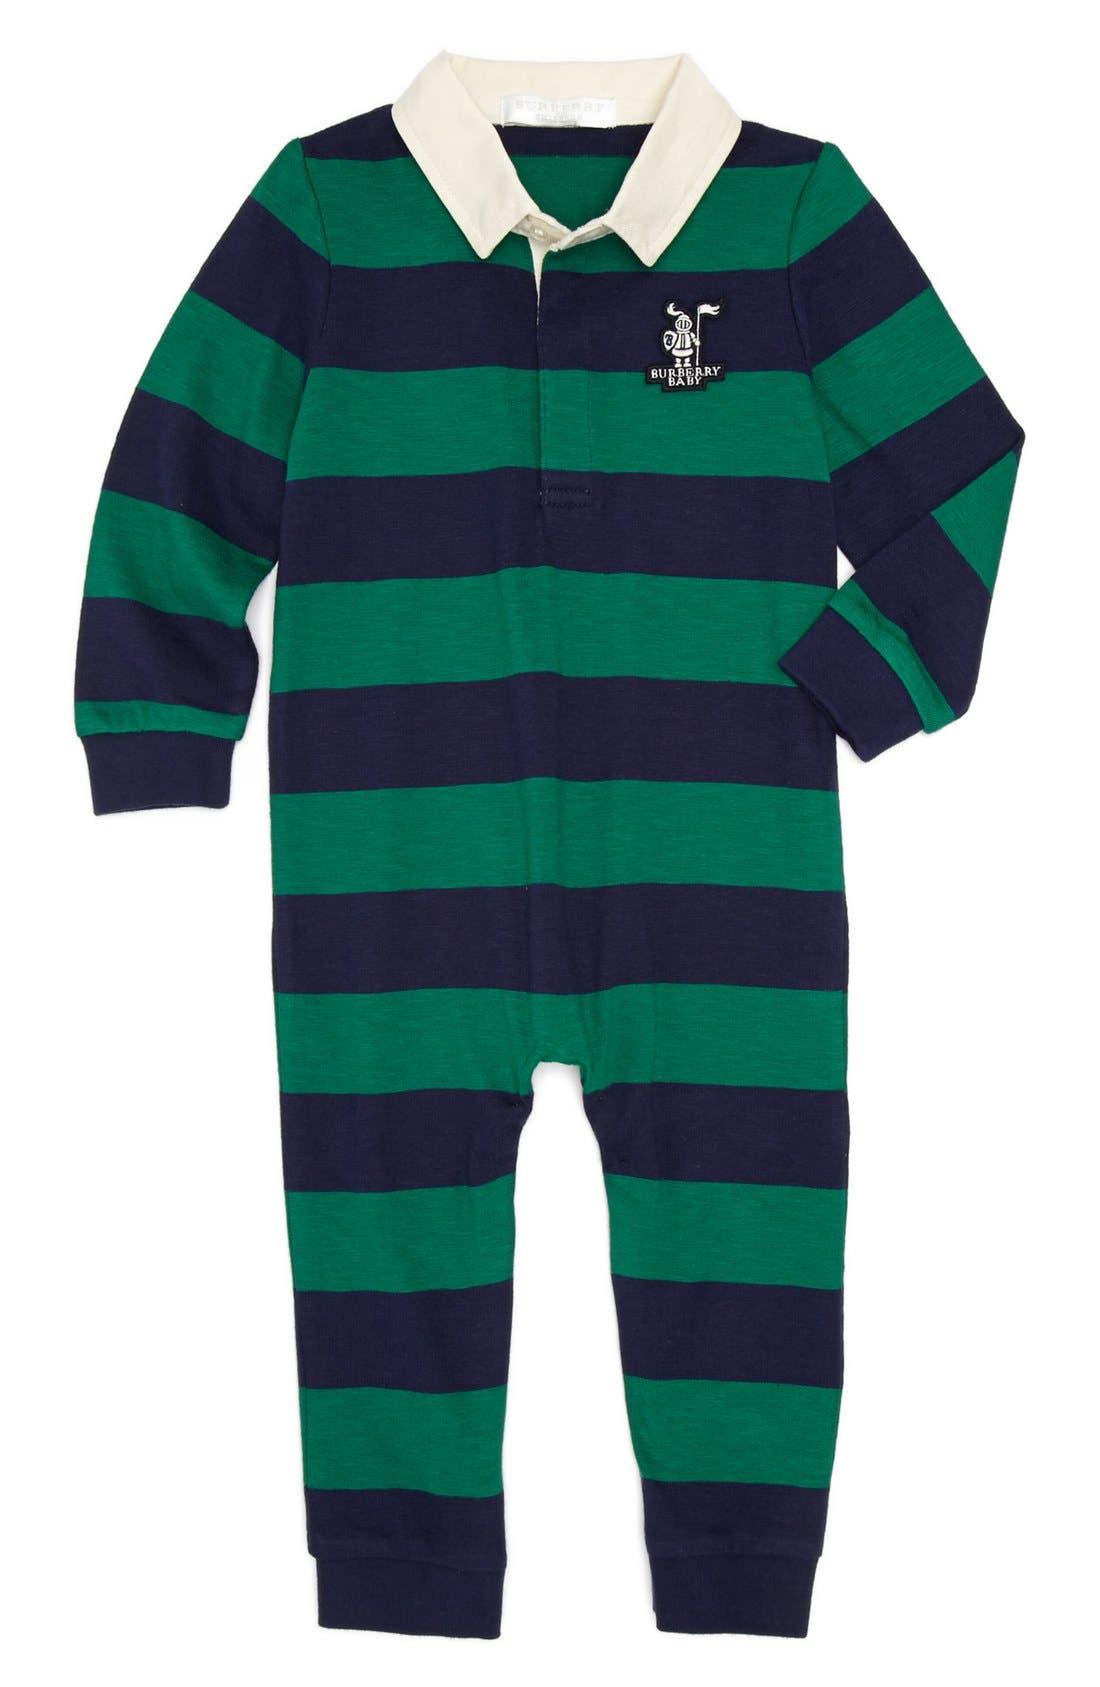 Main Image - Burberry 'Dave' Stripe Romper (Baby)